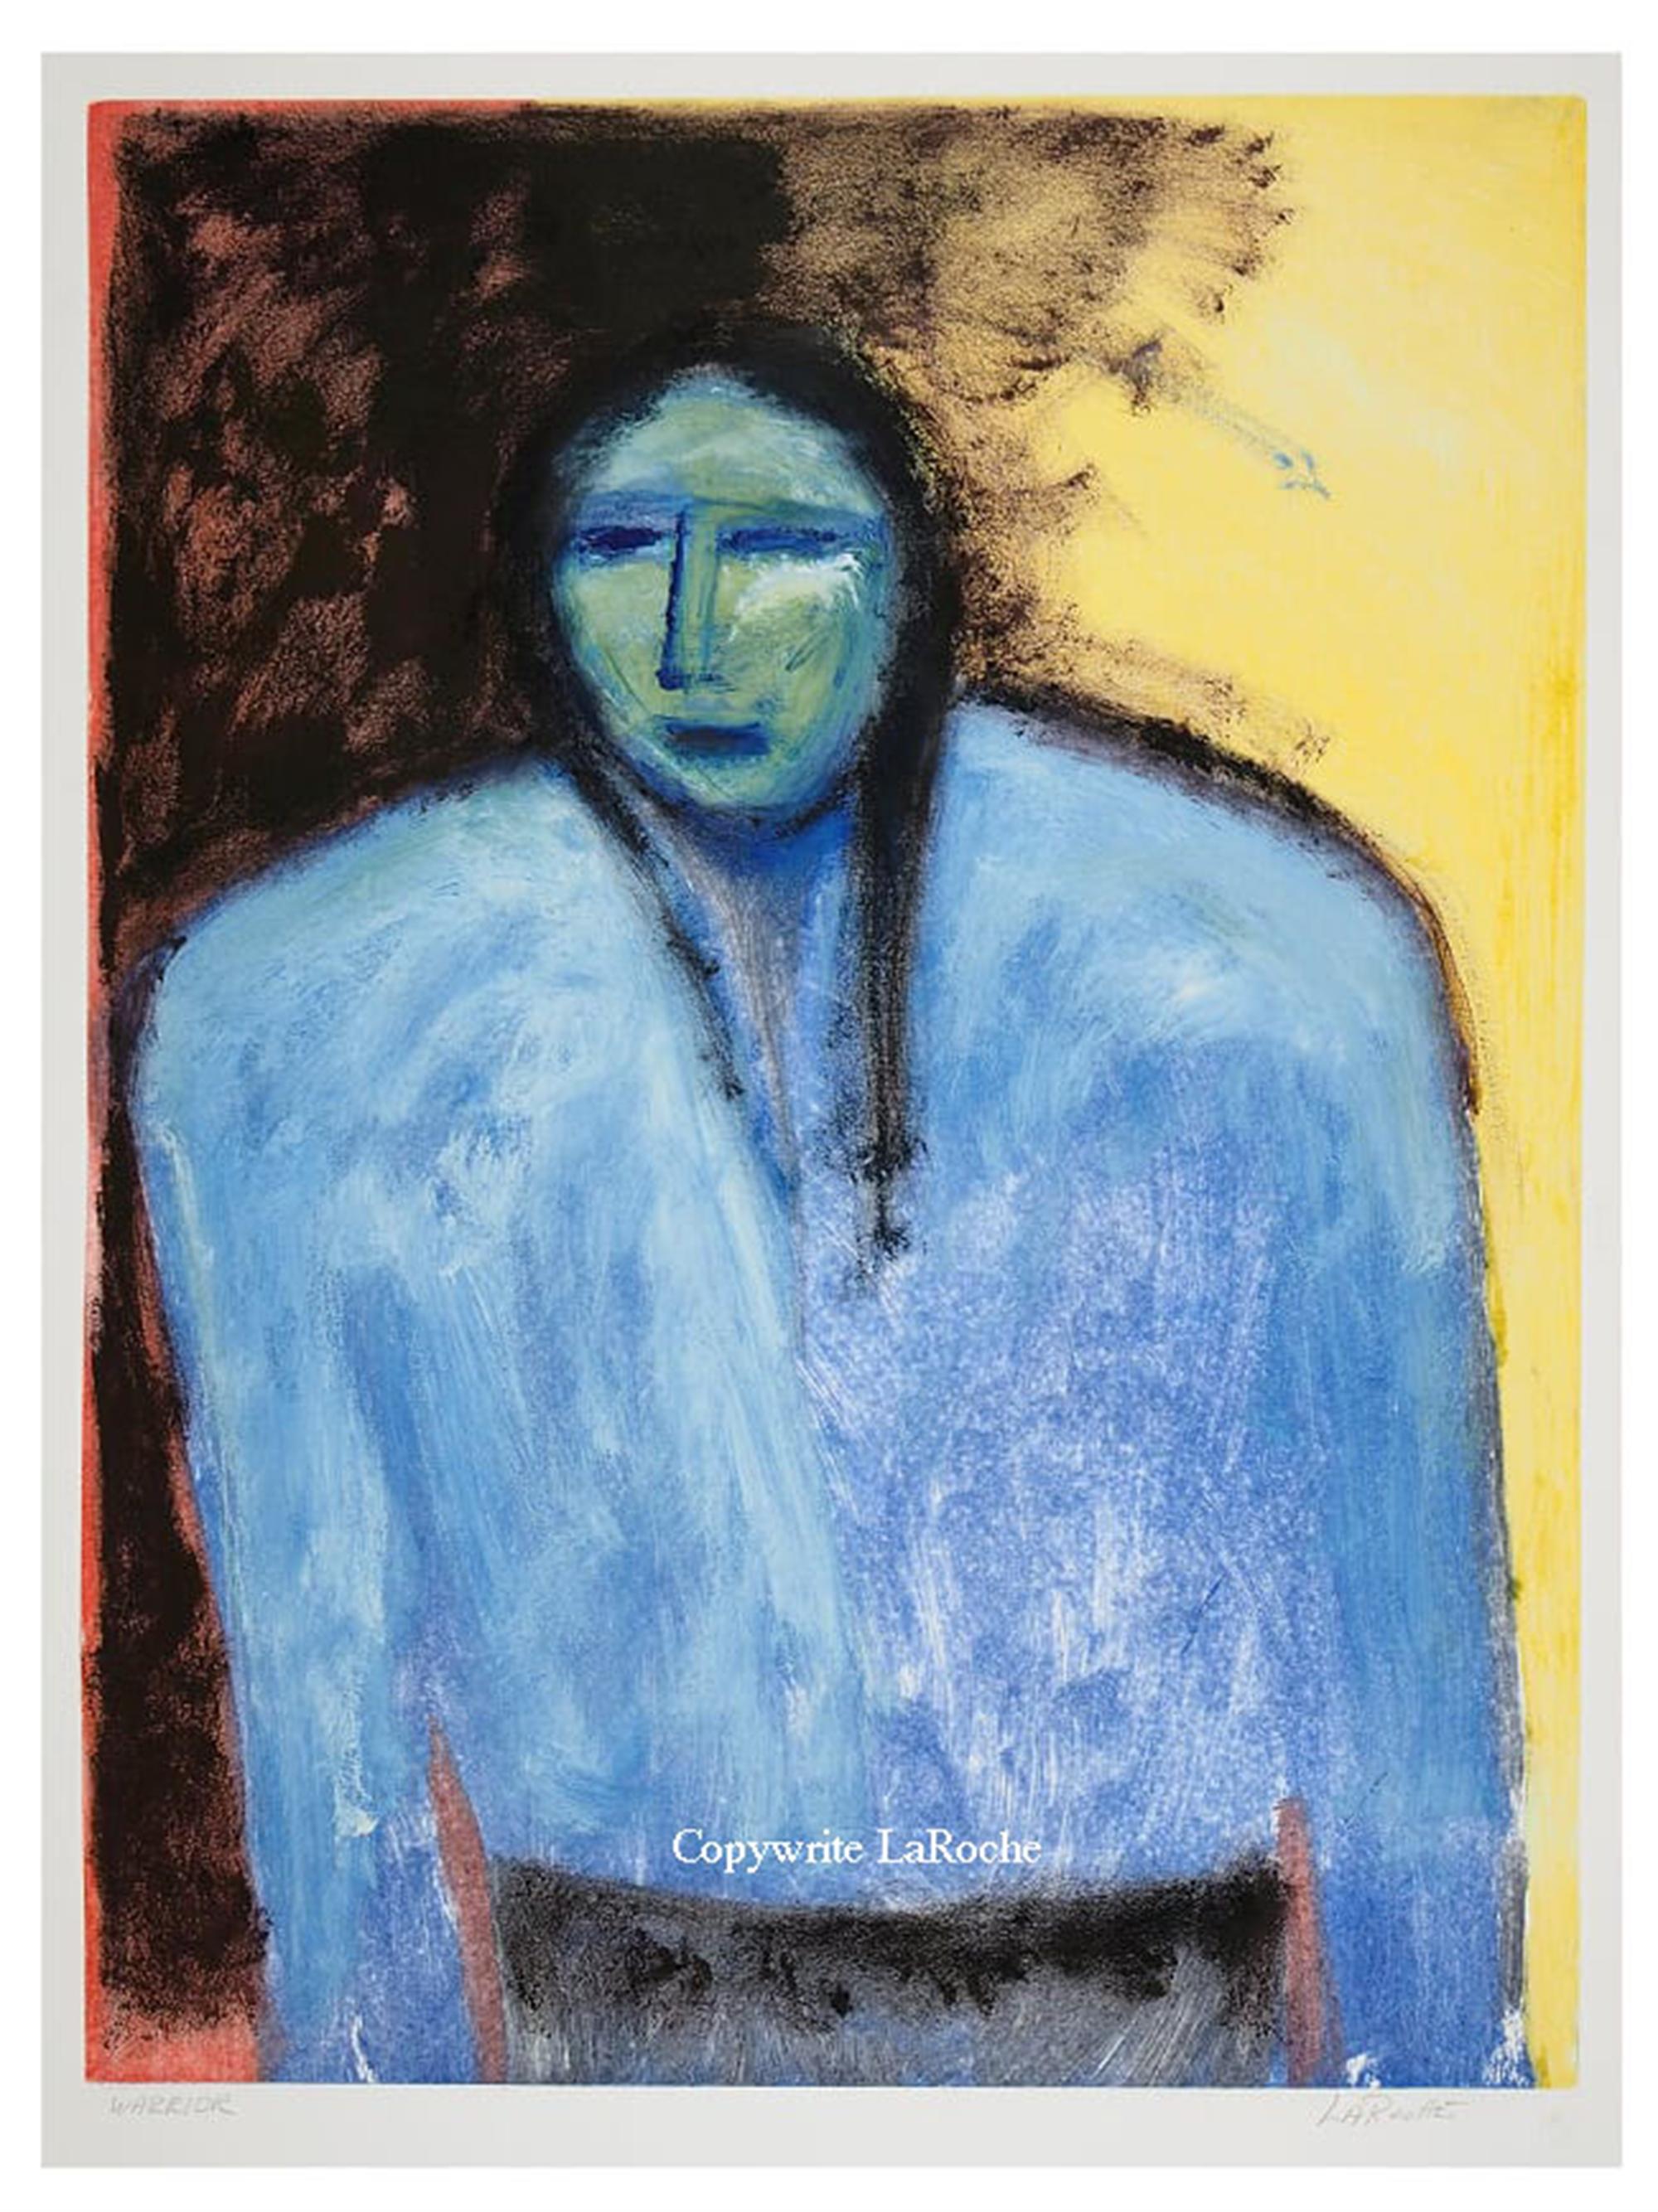 WARRIOR by Carole LaRoche